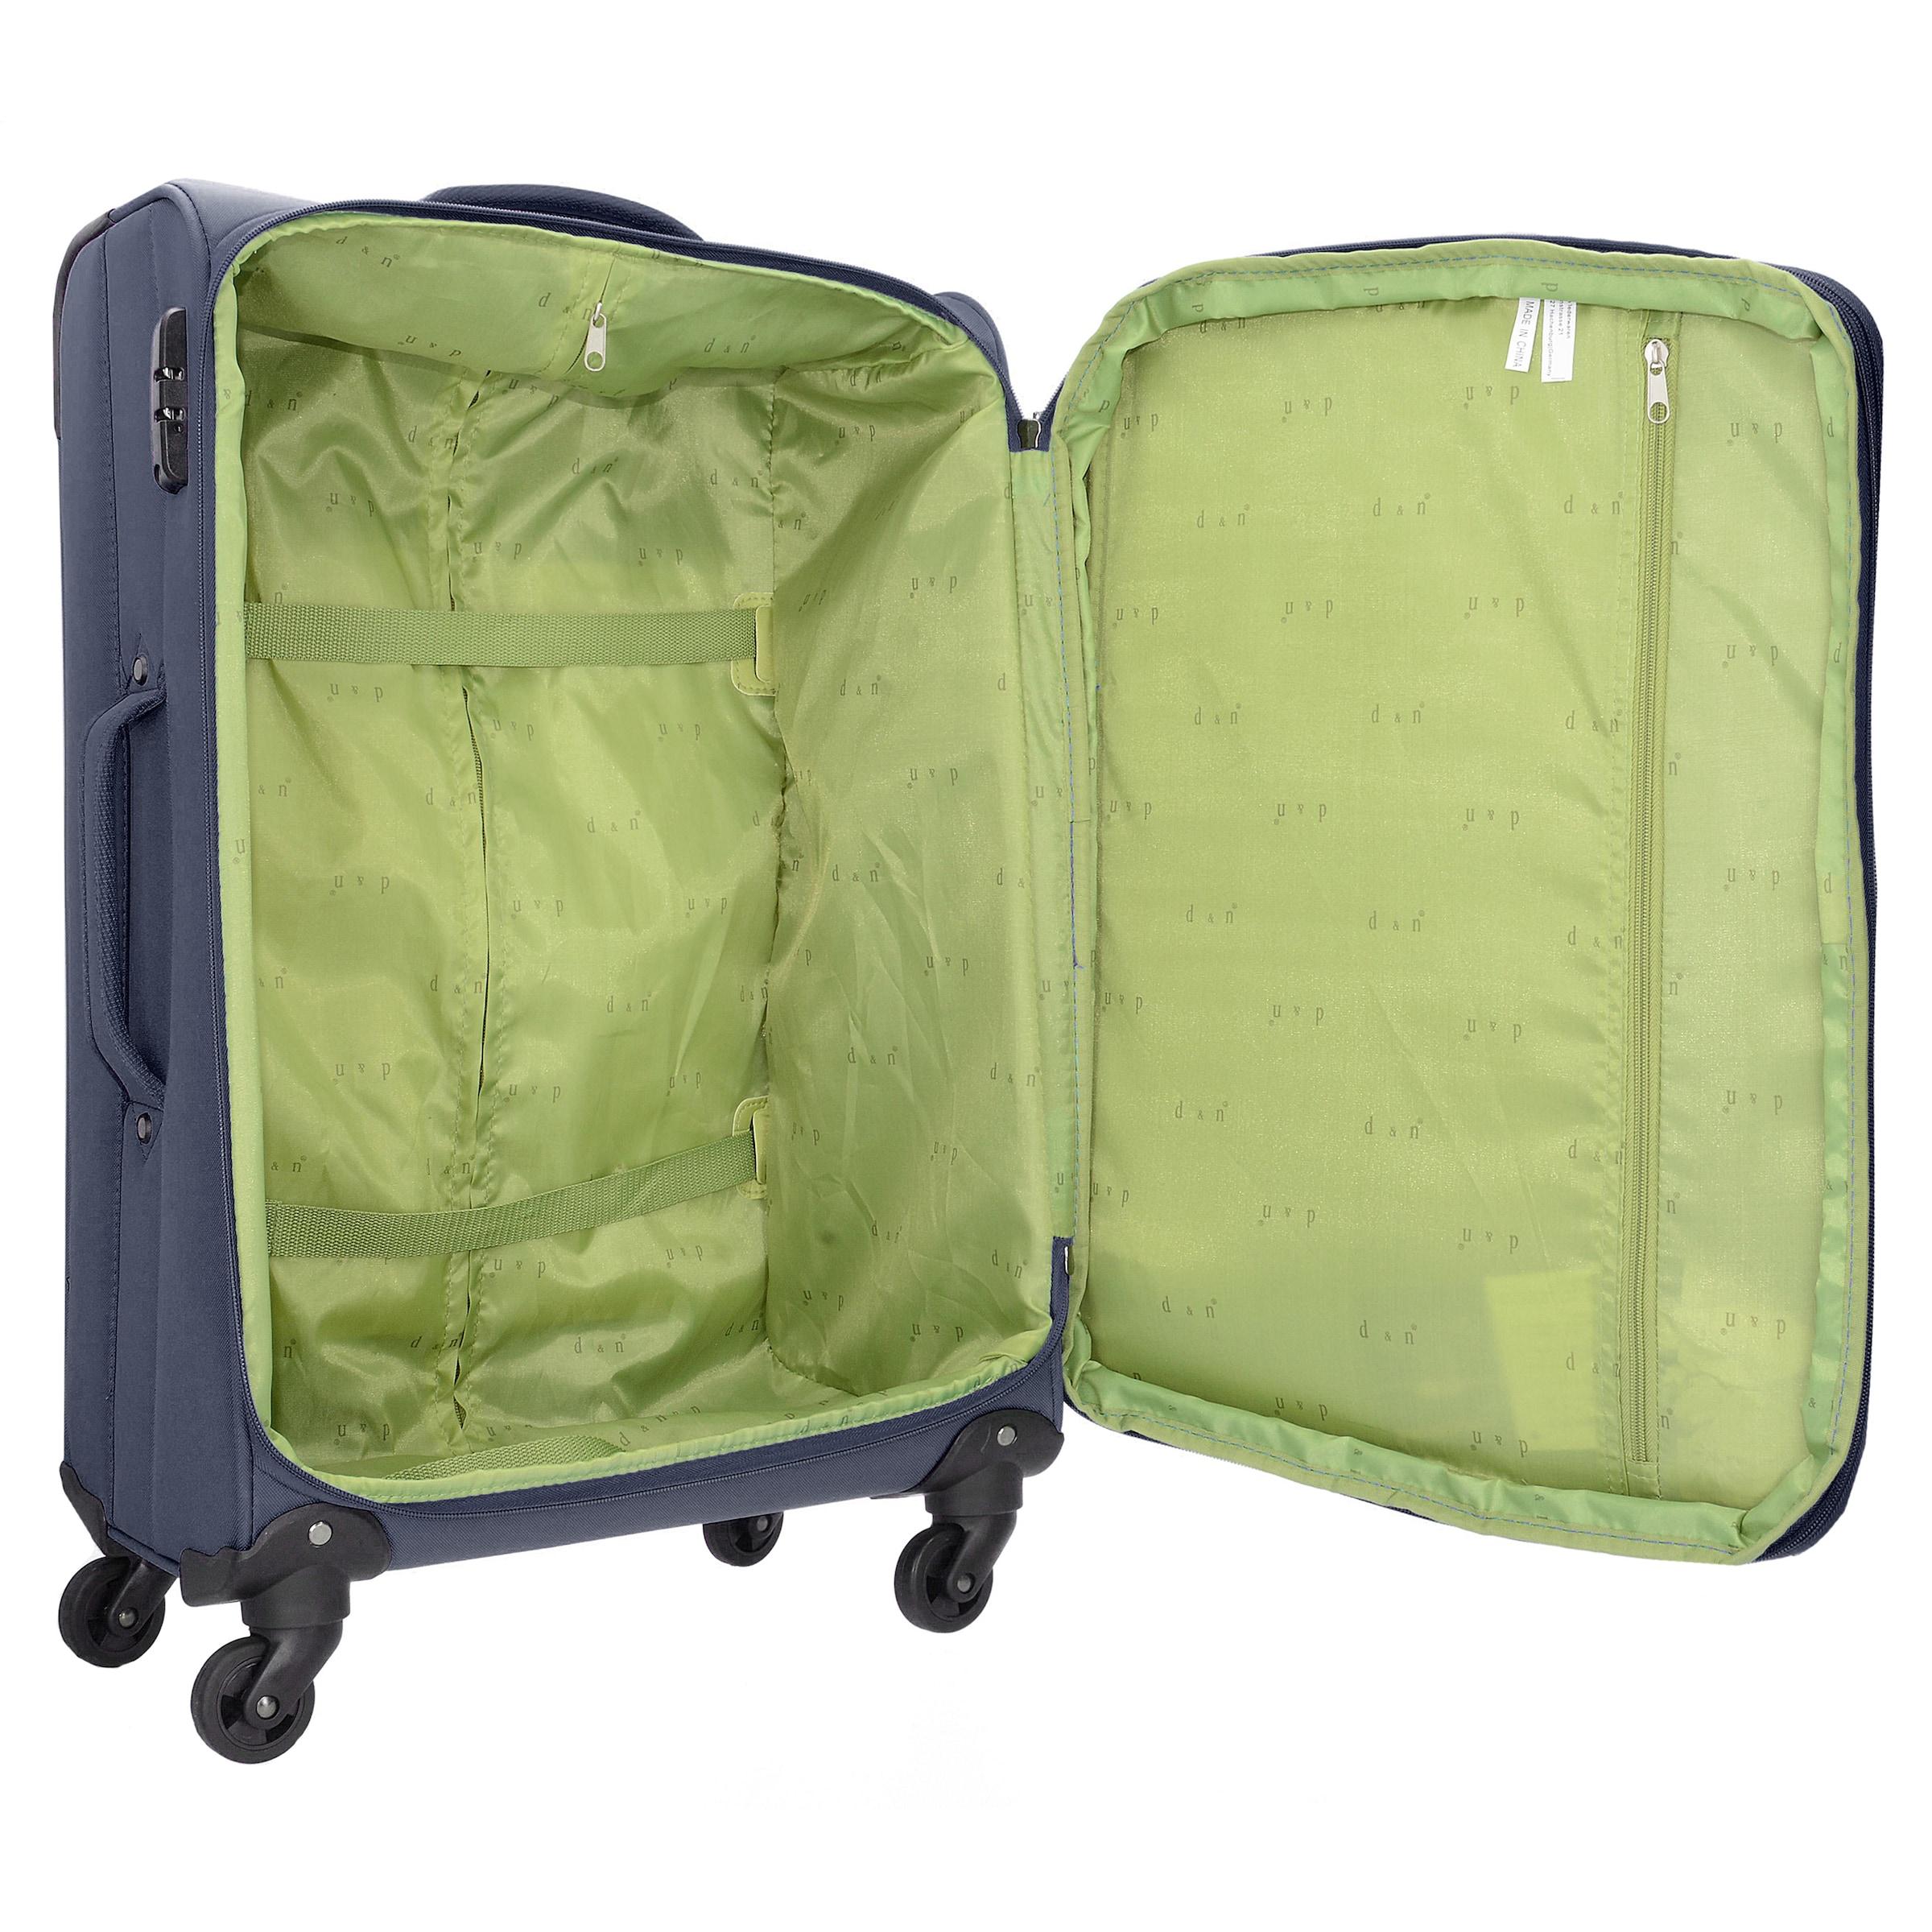 D&N Kofferset in nachtblau / hellgrün